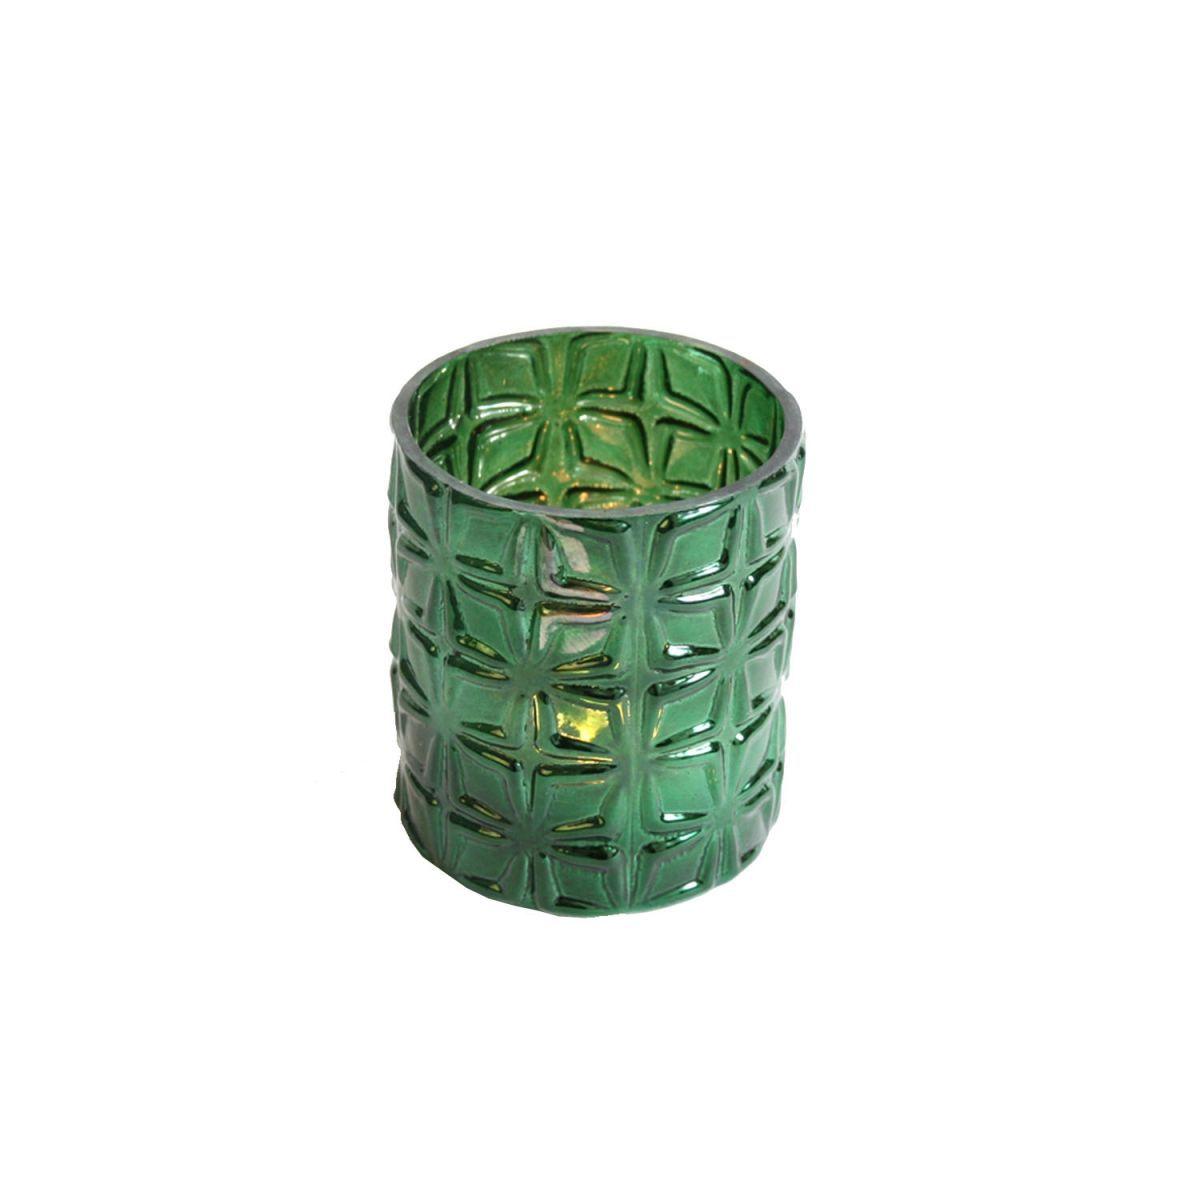 waxinehouder glas groen 9 x 8 cm